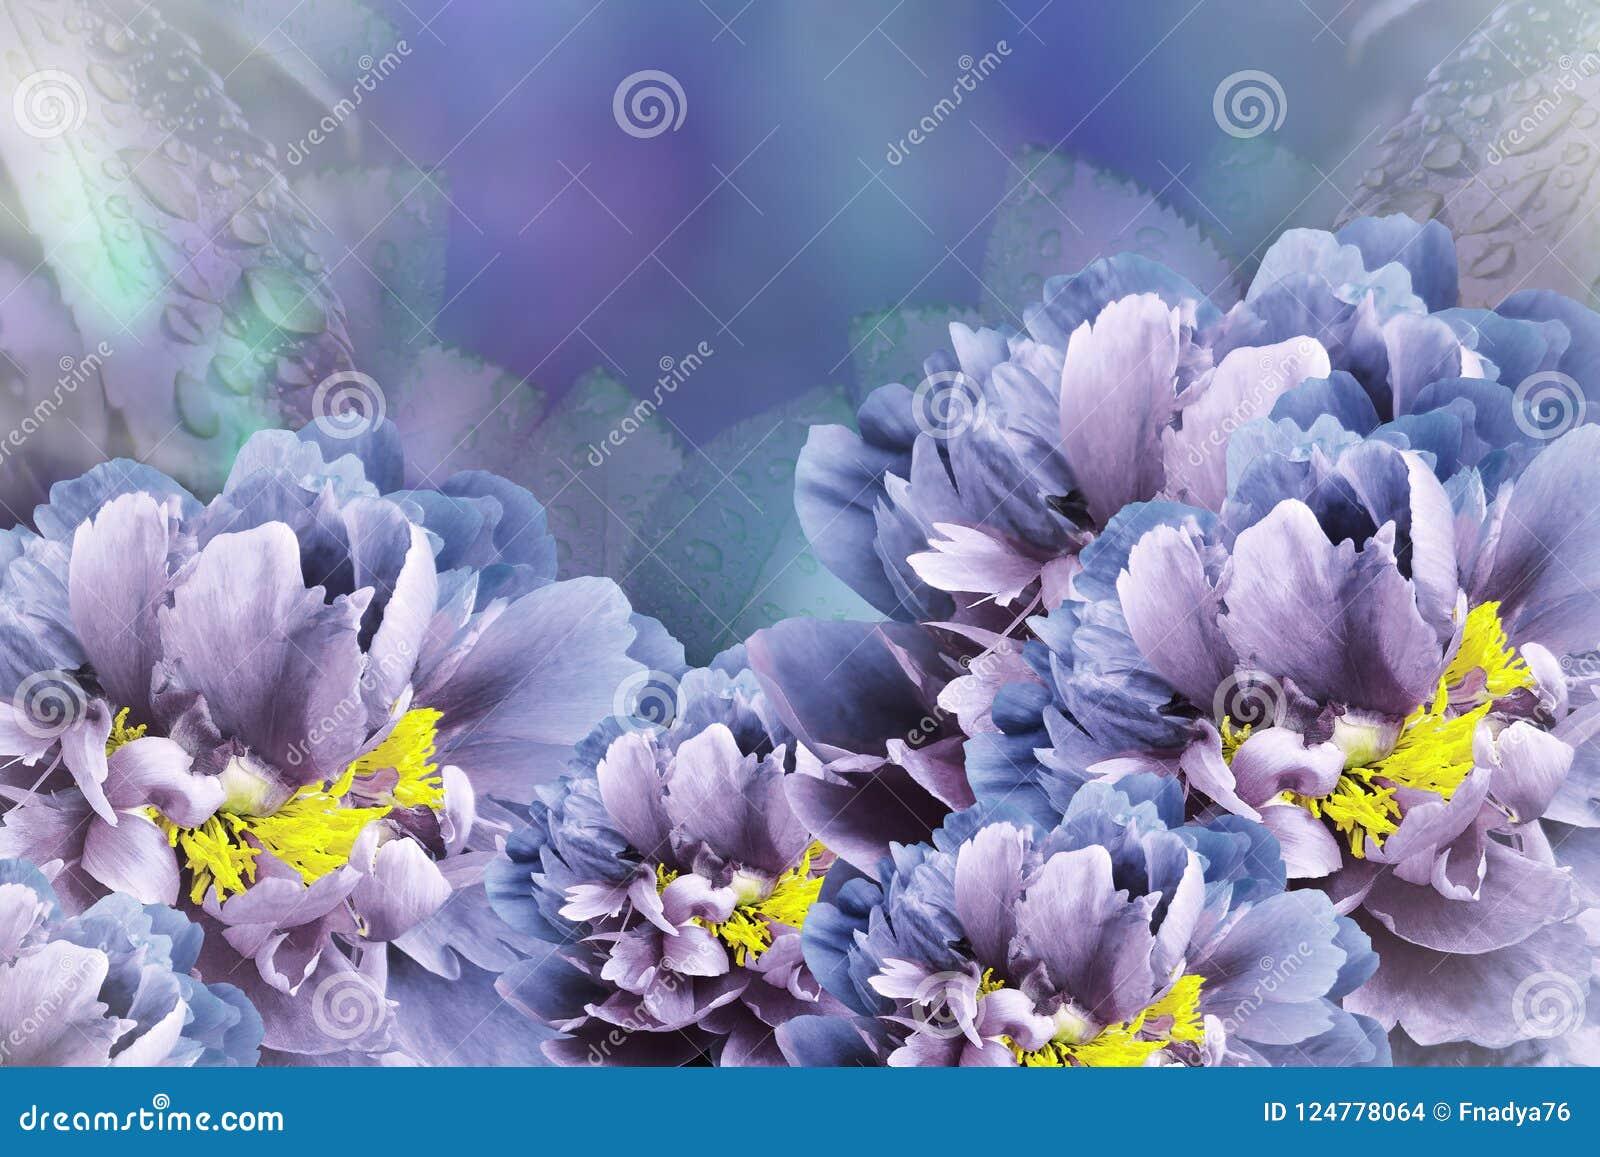 Floral background blue-violet peonies. Flowers close-up on a turquoise-blue-violet background. Flower composition